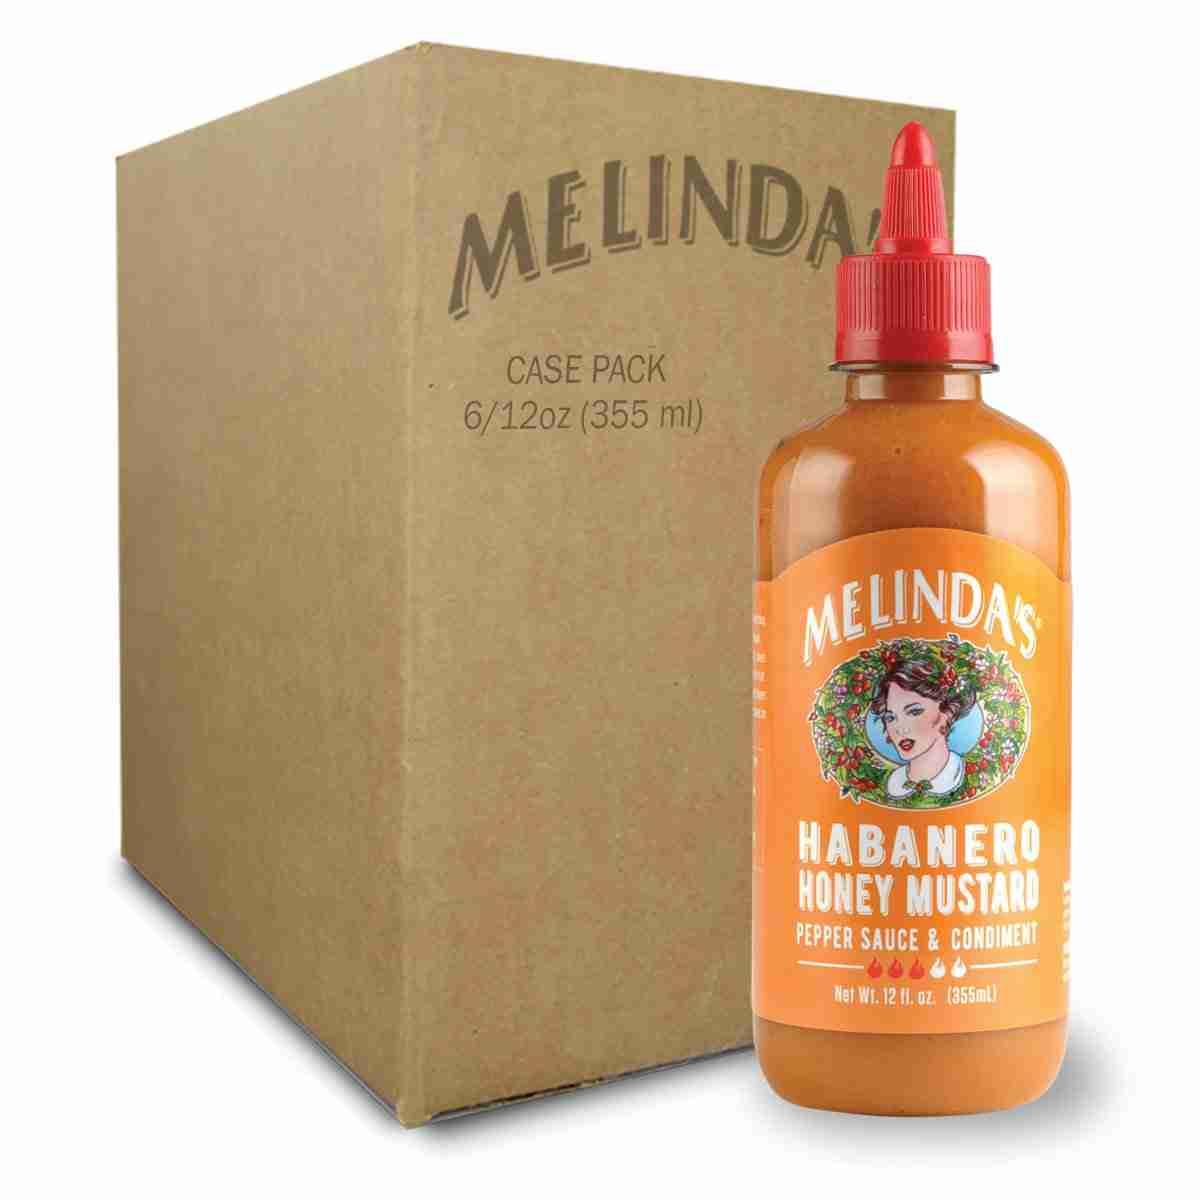 Melinda's Hot Habanero Honey Mustard Pepper Sauce (Case)